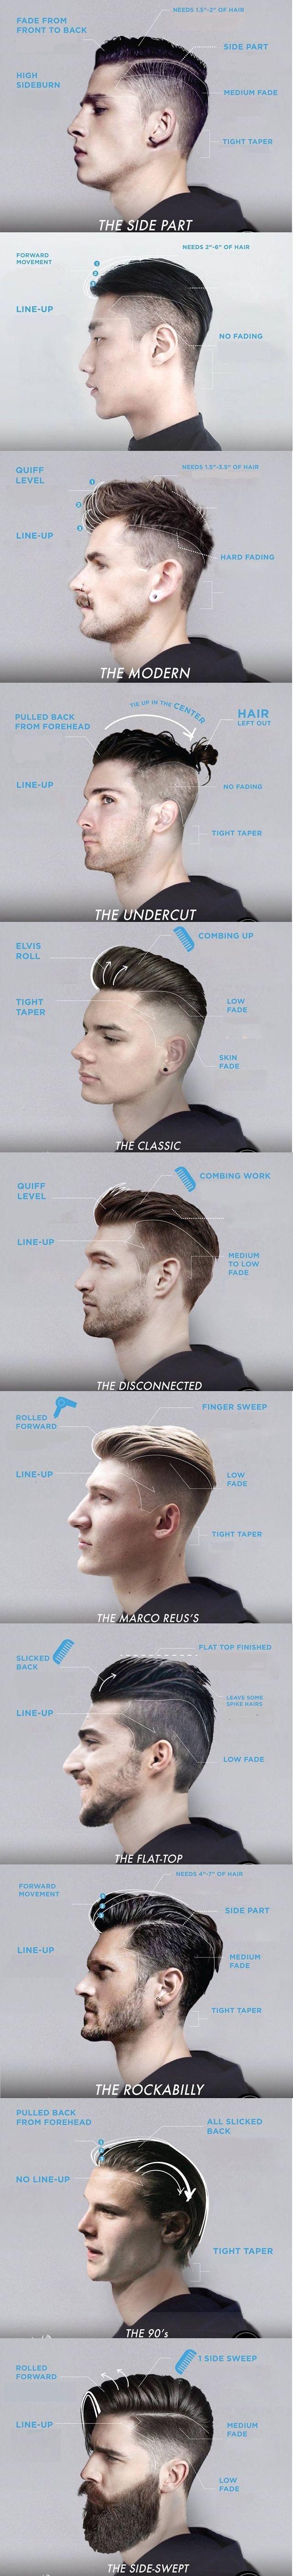 Pleasant 1000 Ideas About Guy Haircuts On Pinterest Guy Haircut Styles Short Hairstyles Gunalazisus